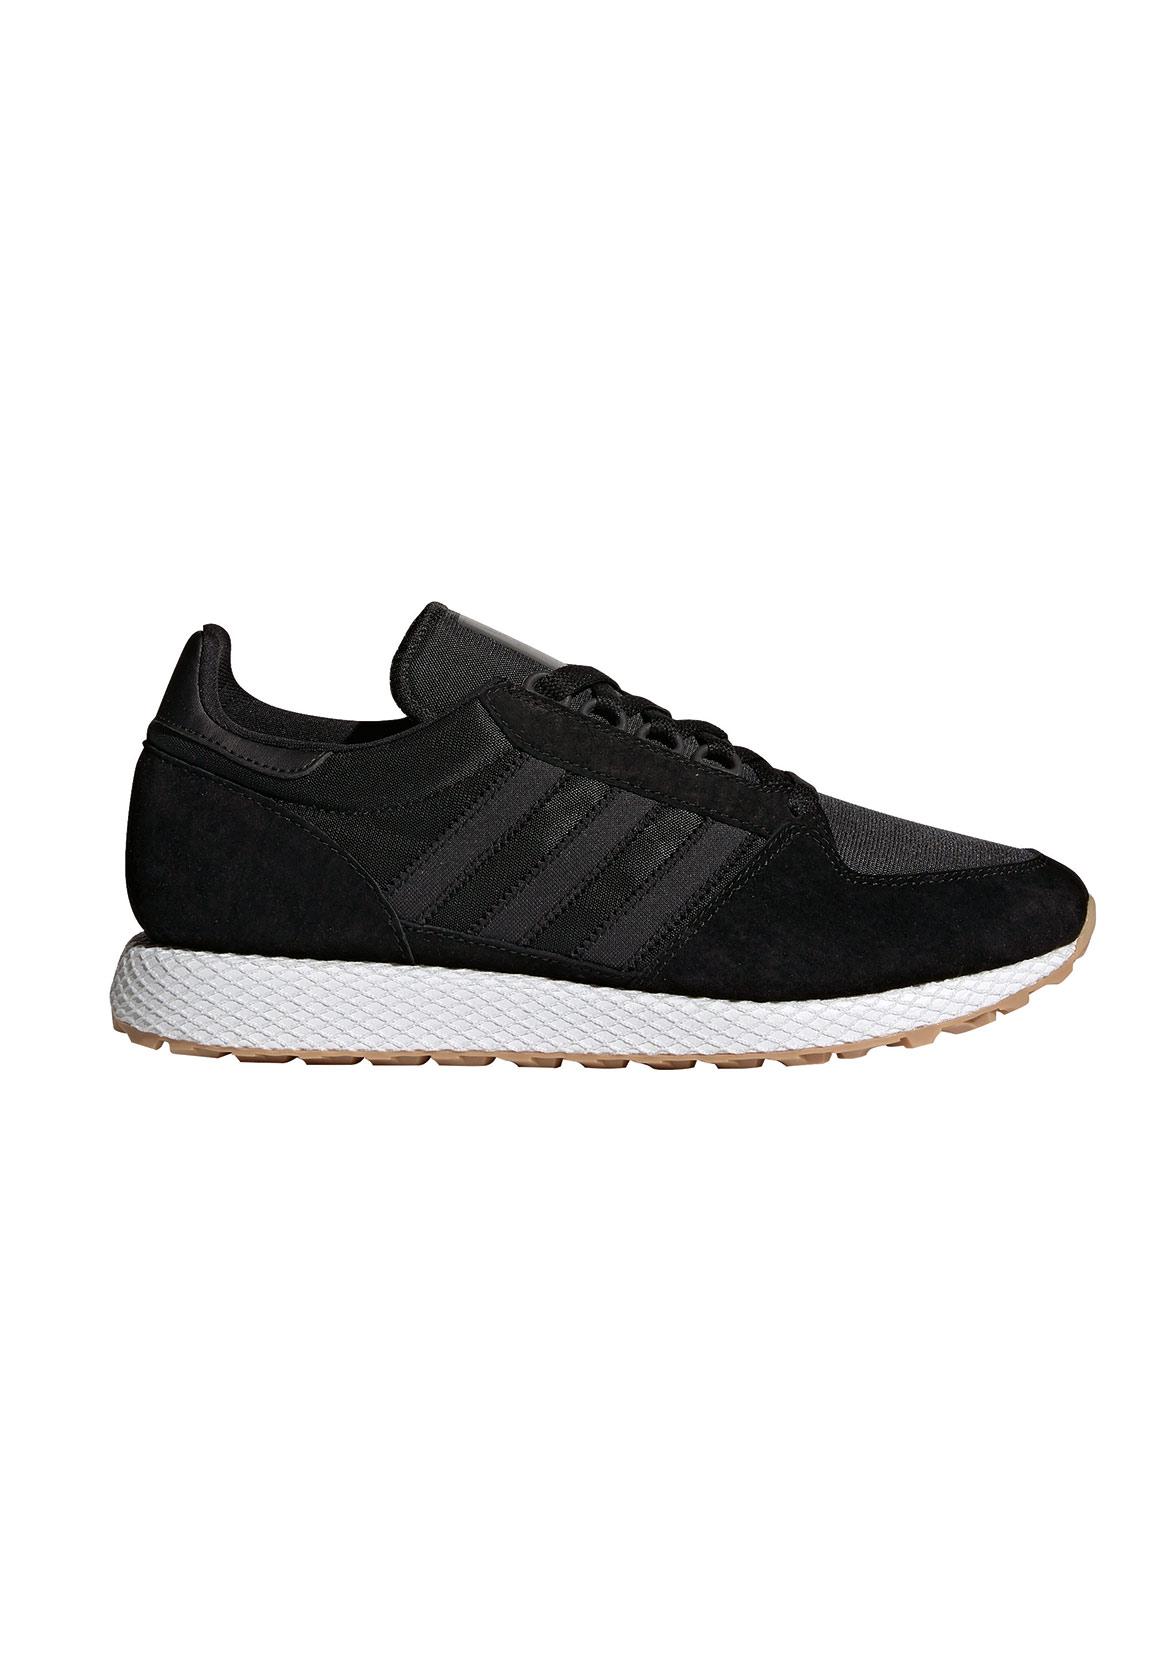 Adidas Originals Sneaker FOREST GROVE CG5673 Schwarz